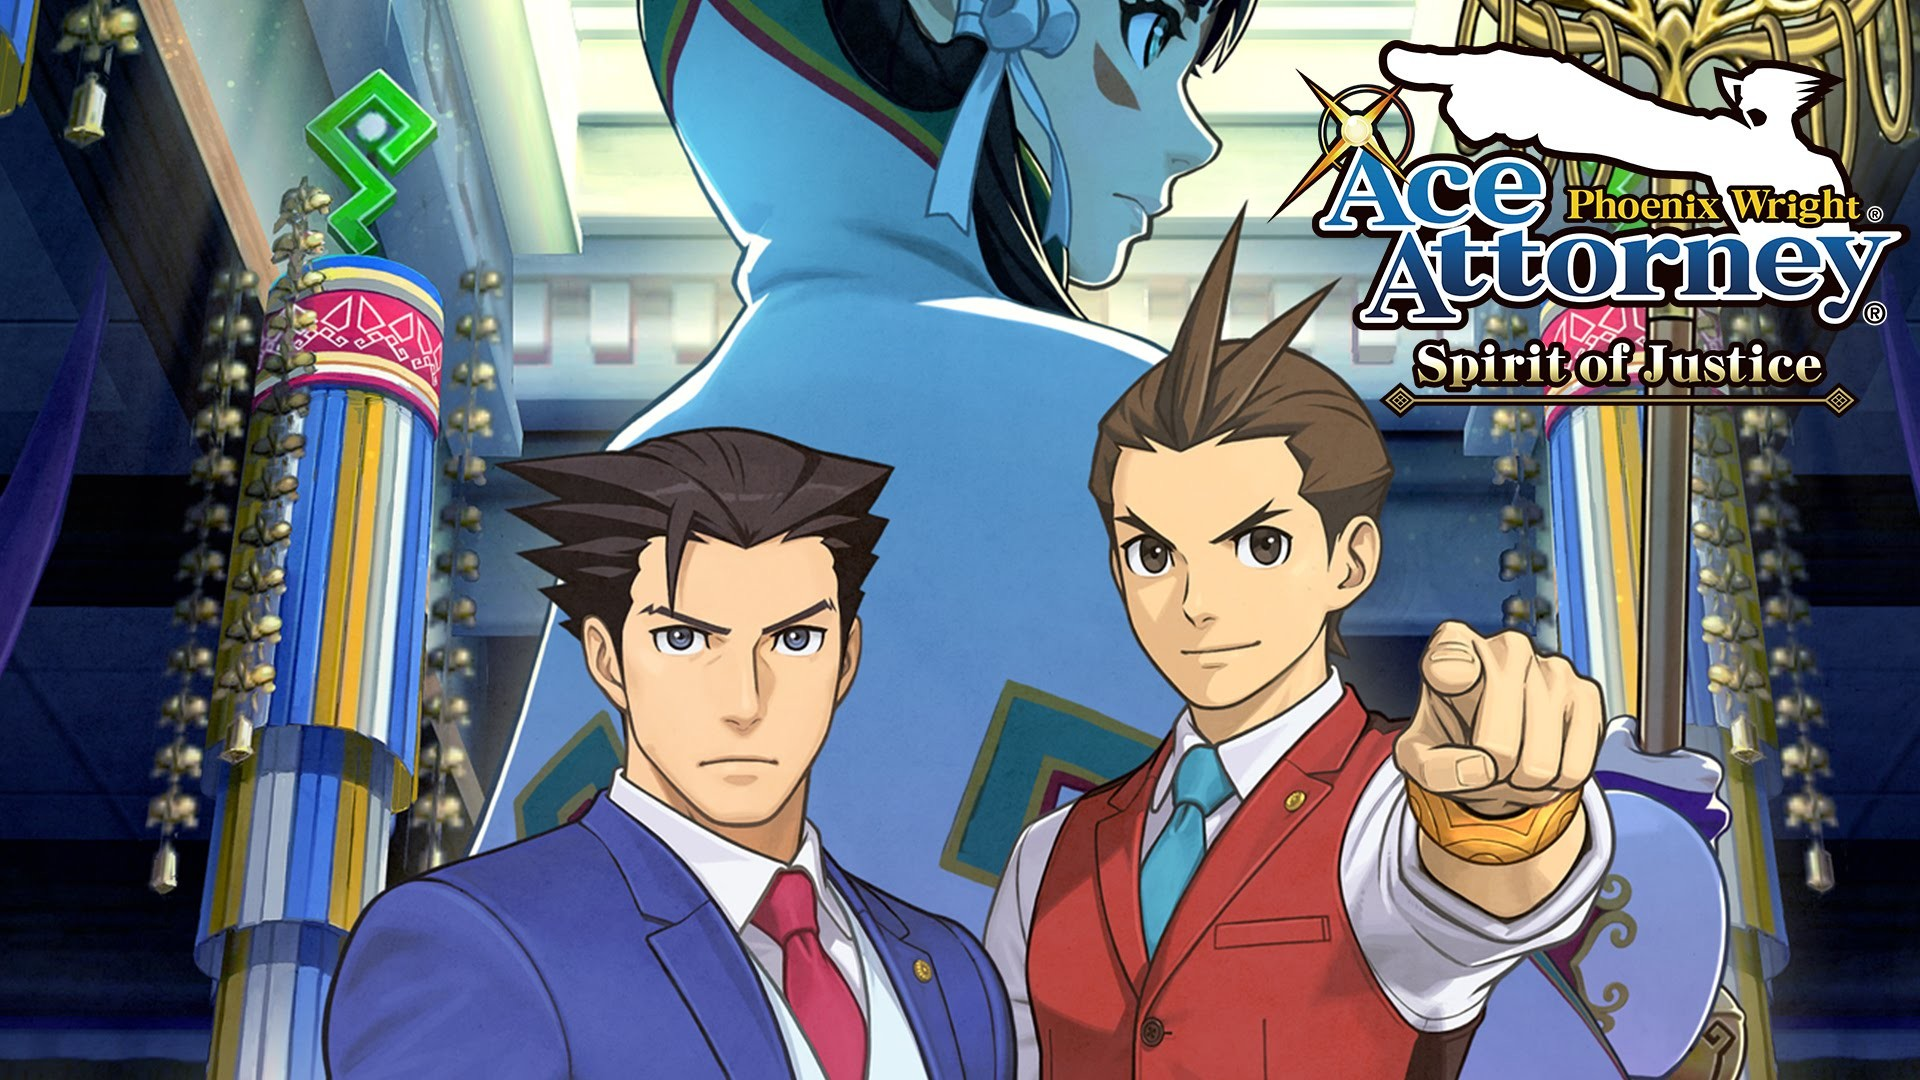 Phoenix Wright: Ace Attorney – Spirit of Justice Trailer